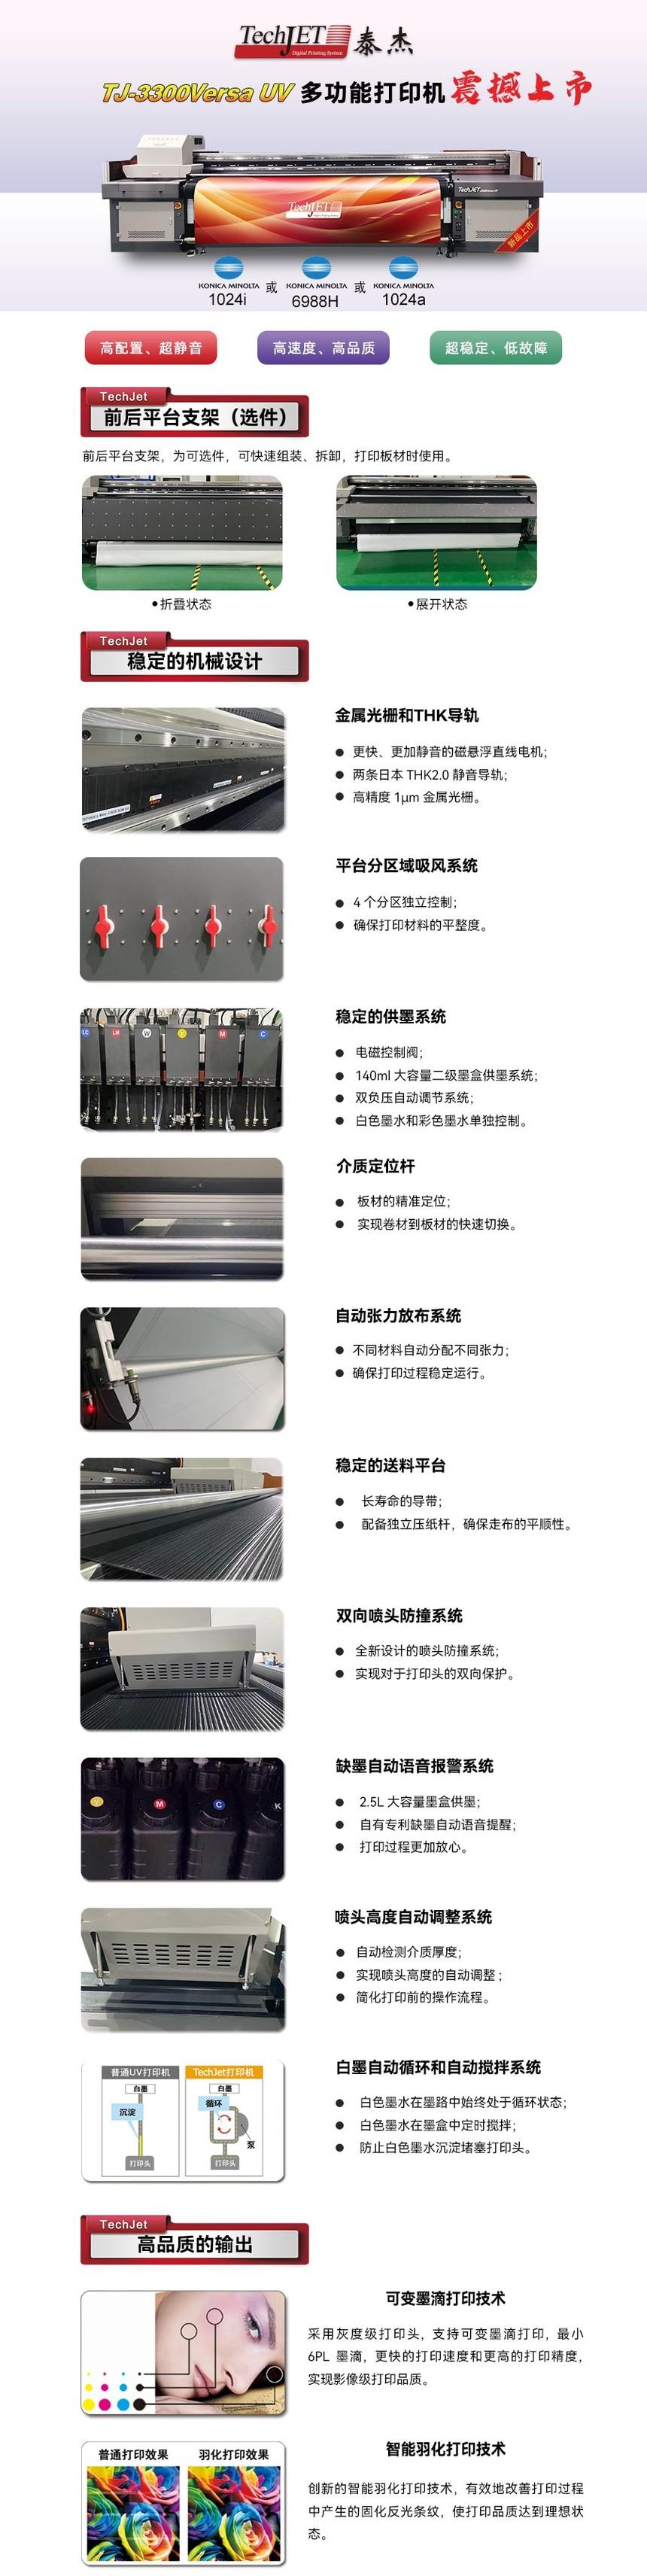 TJ-3300Versa-UV中文产品说明(1).jpg